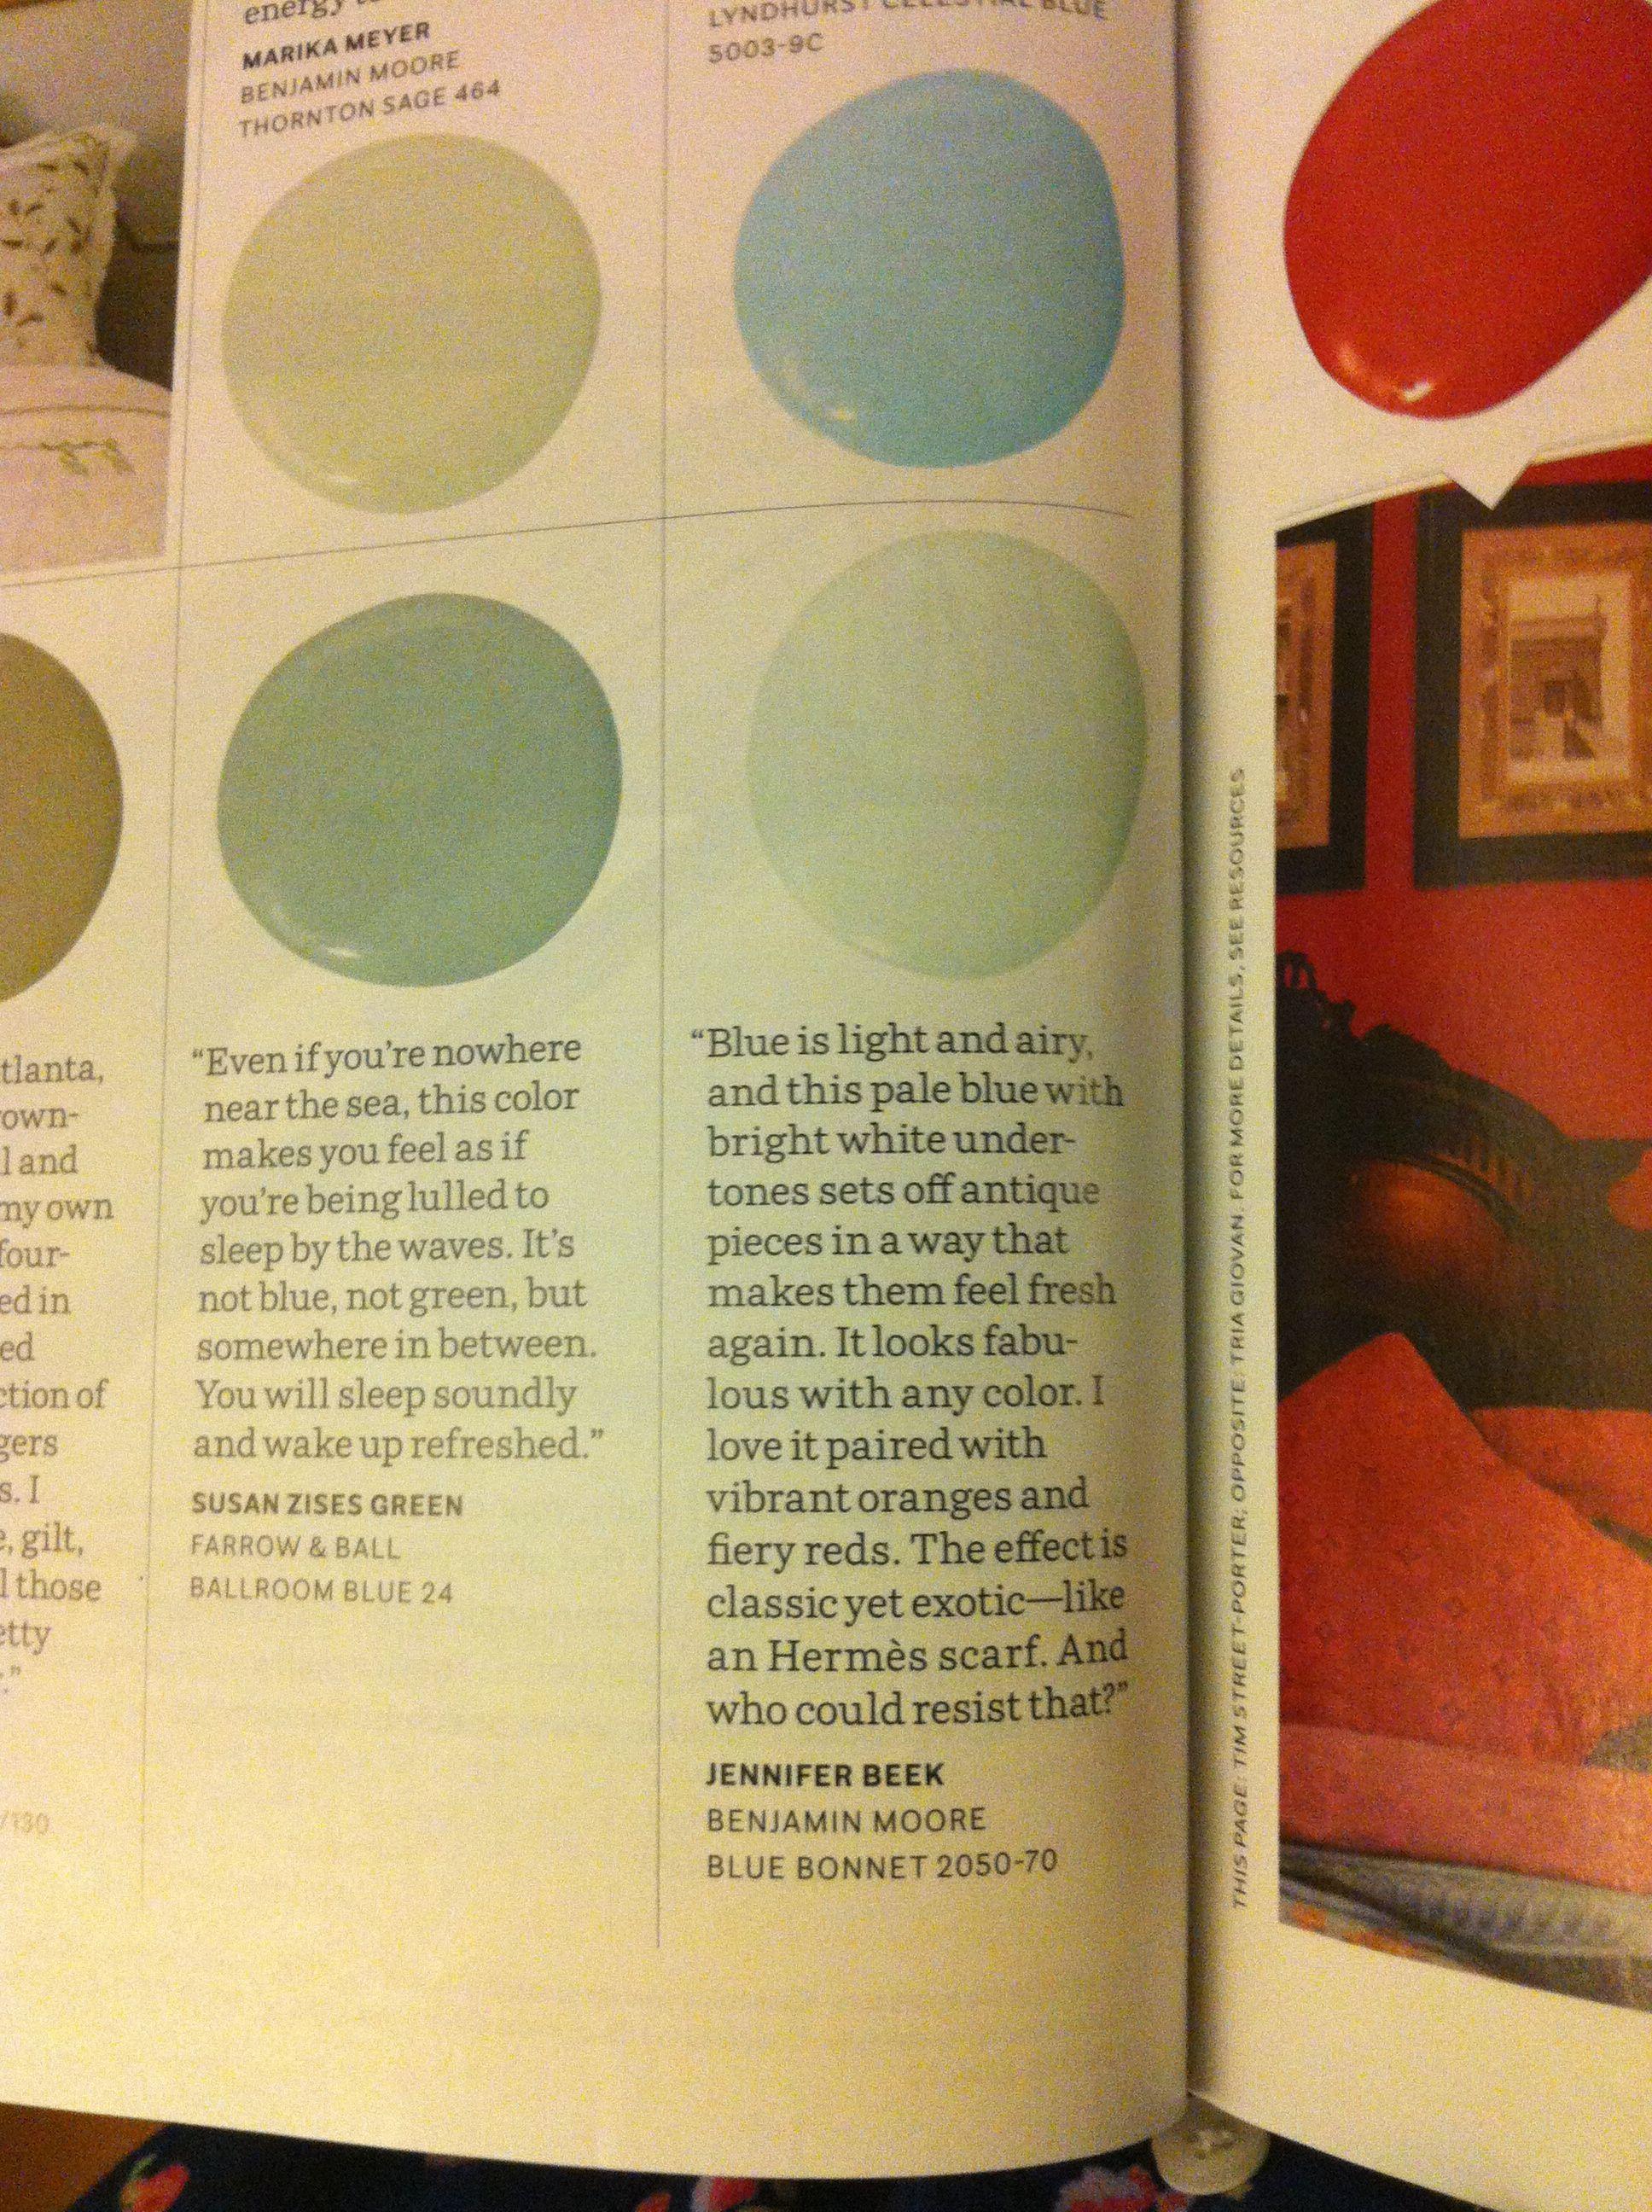 Benjamin Moore Blue Bonnet | Decorating | Pinterest | Benjamin moore ...